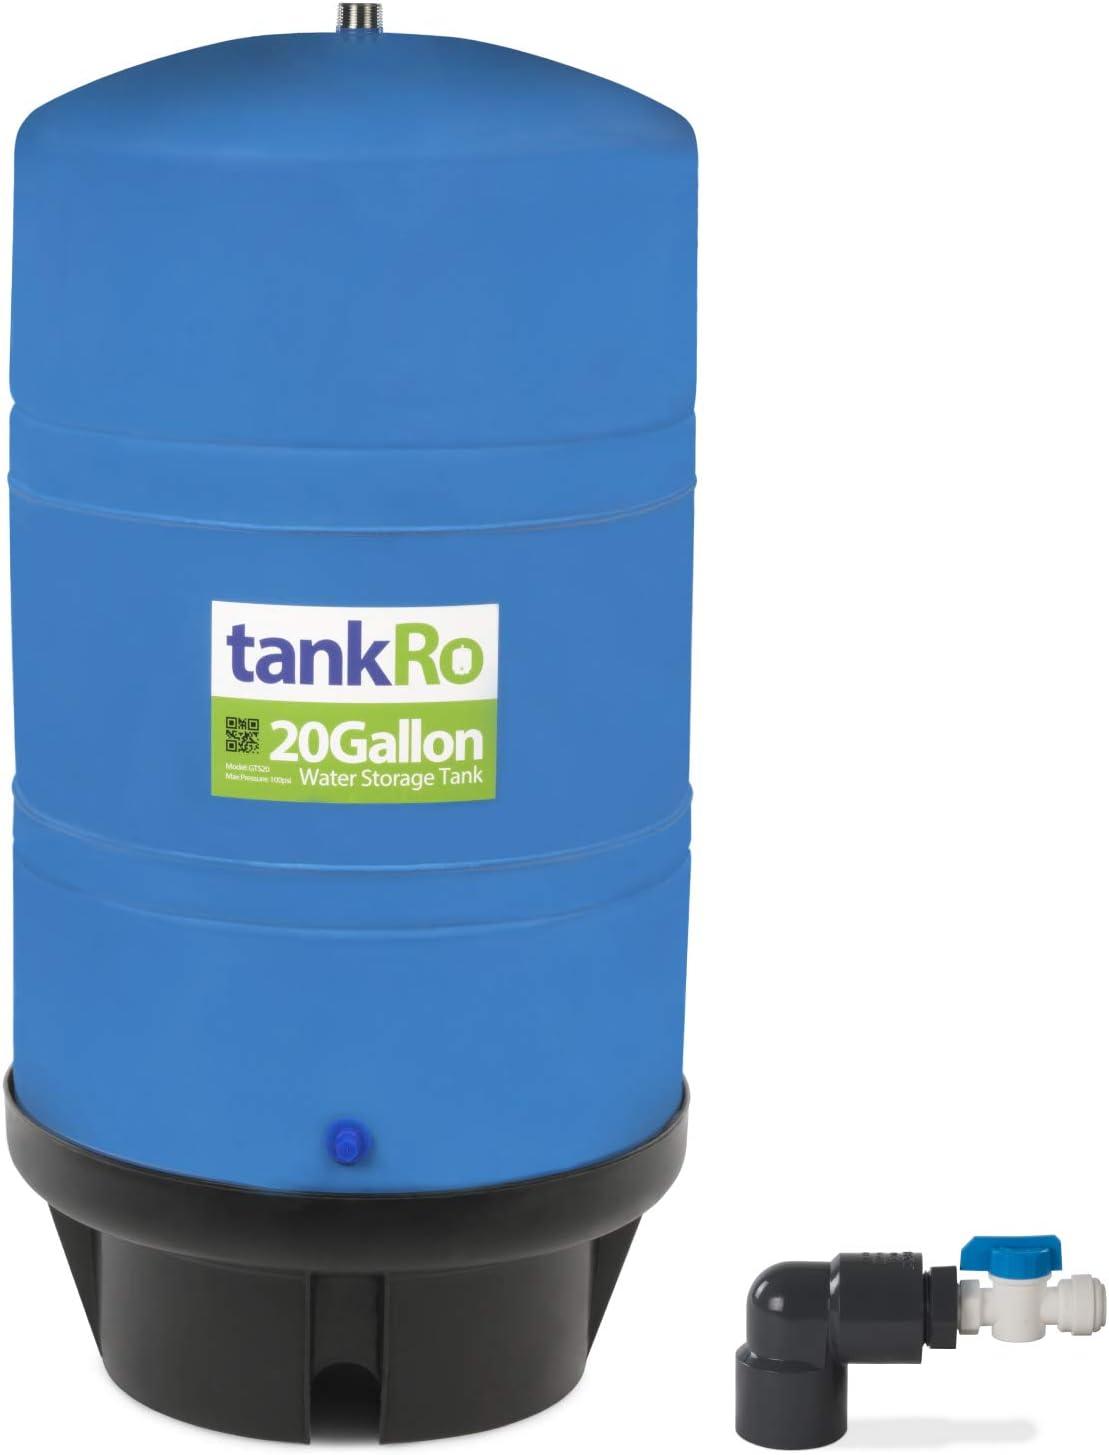 20 Gallon RO Expansion Tank – Large Reverse Osmosis Water Storage Pressure Tank by tankRO – with FREE Tank Ball Valve